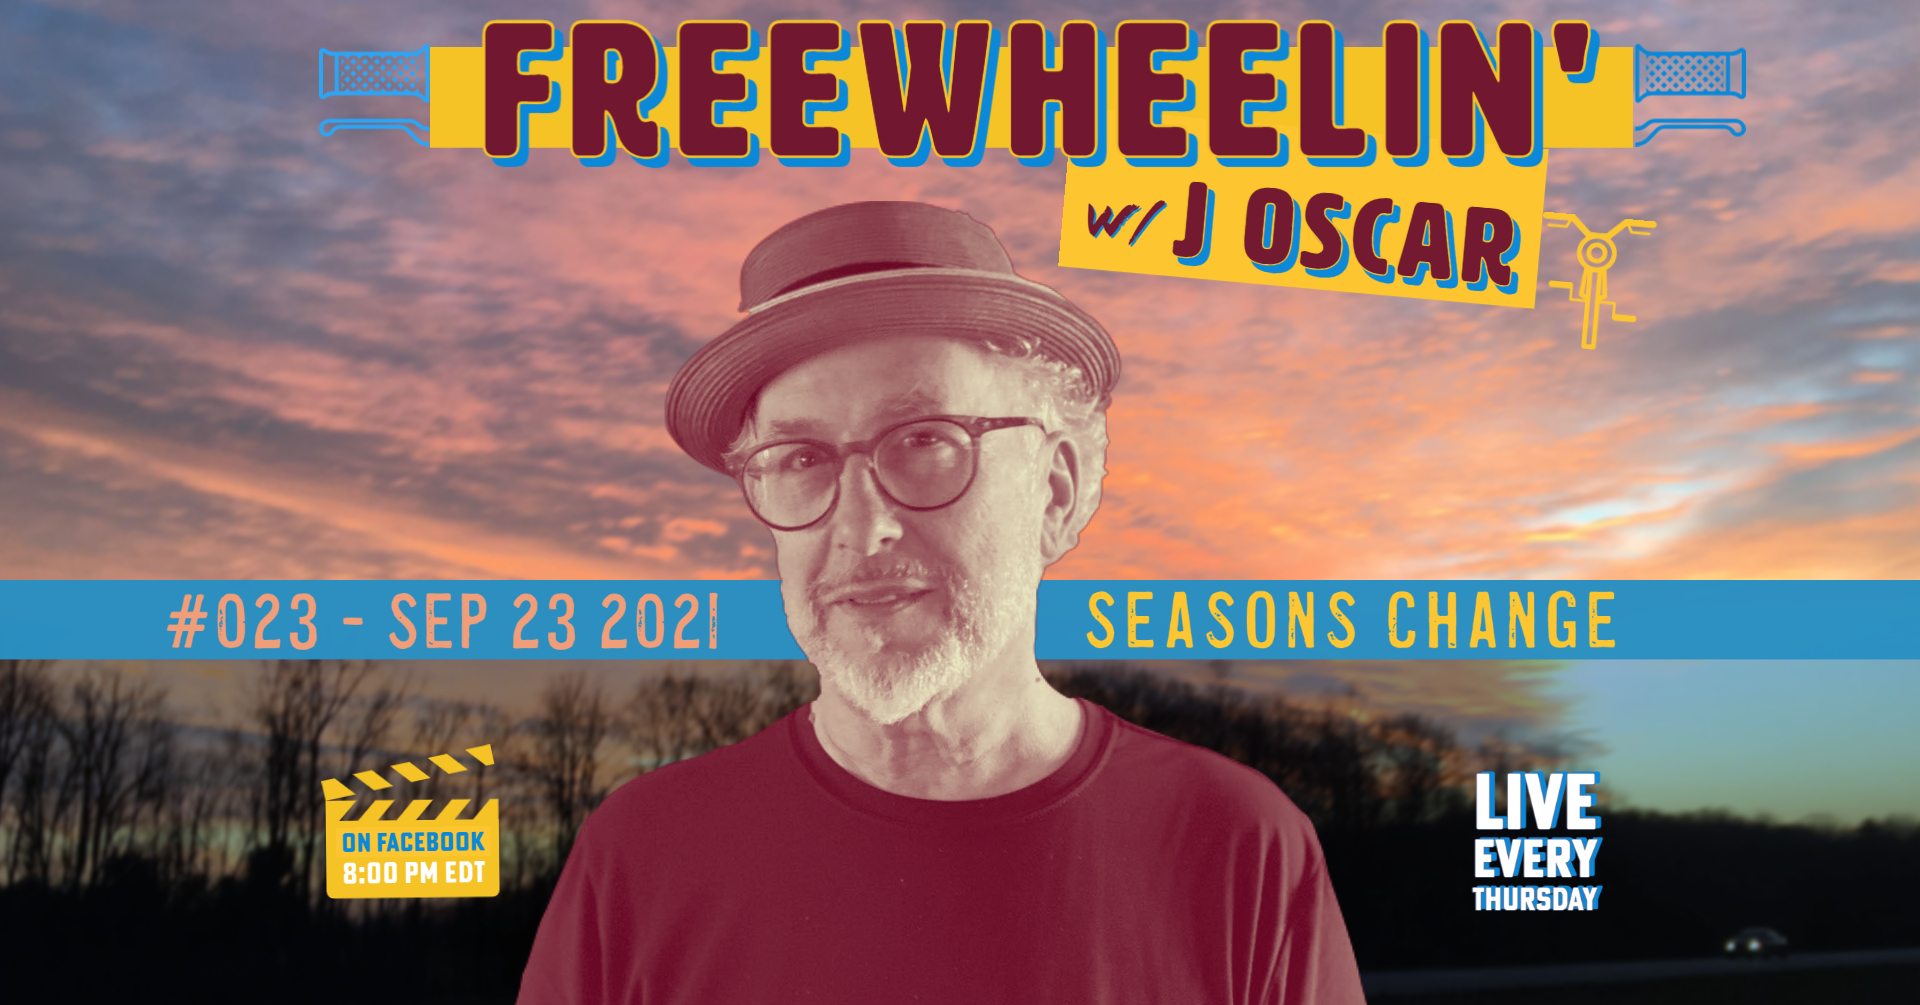 Freewheelin 23 - Seasons Change